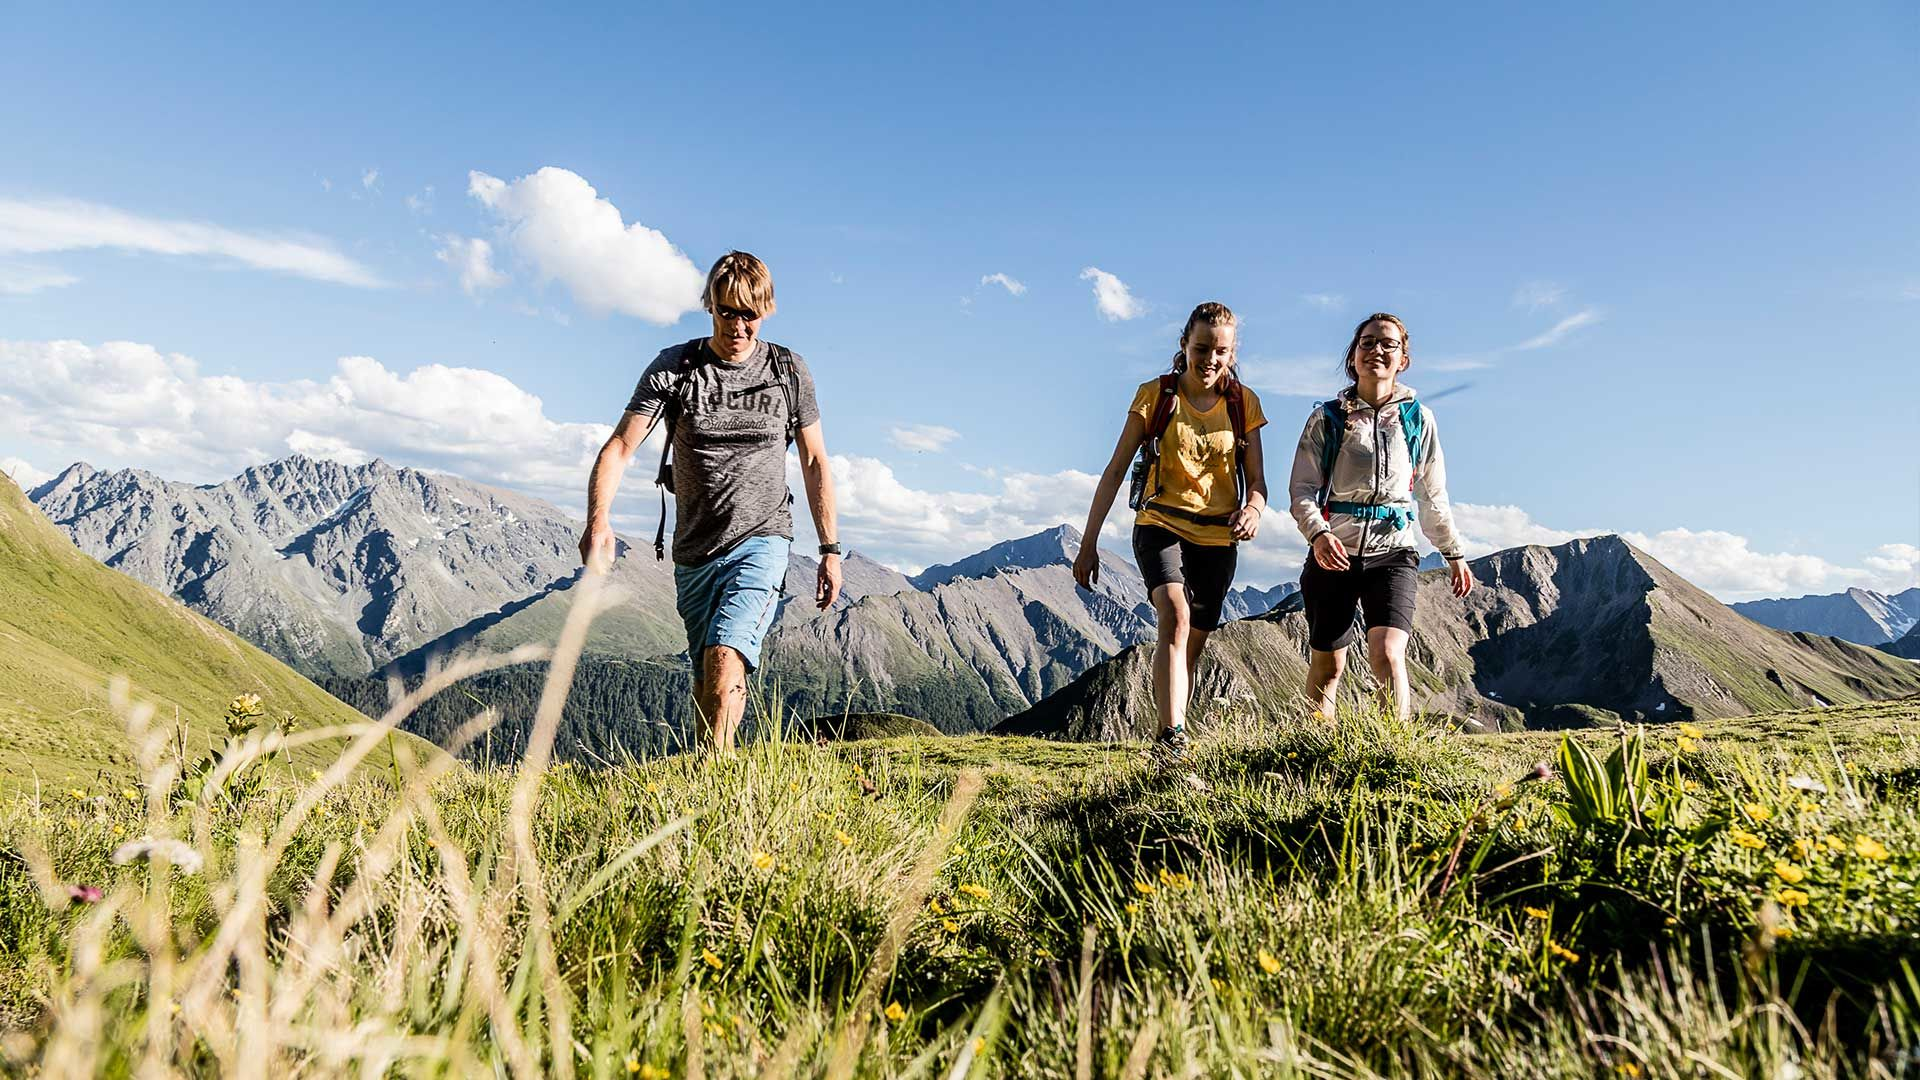 Gipfel zum Anfassen nah Natur hautnah erleben